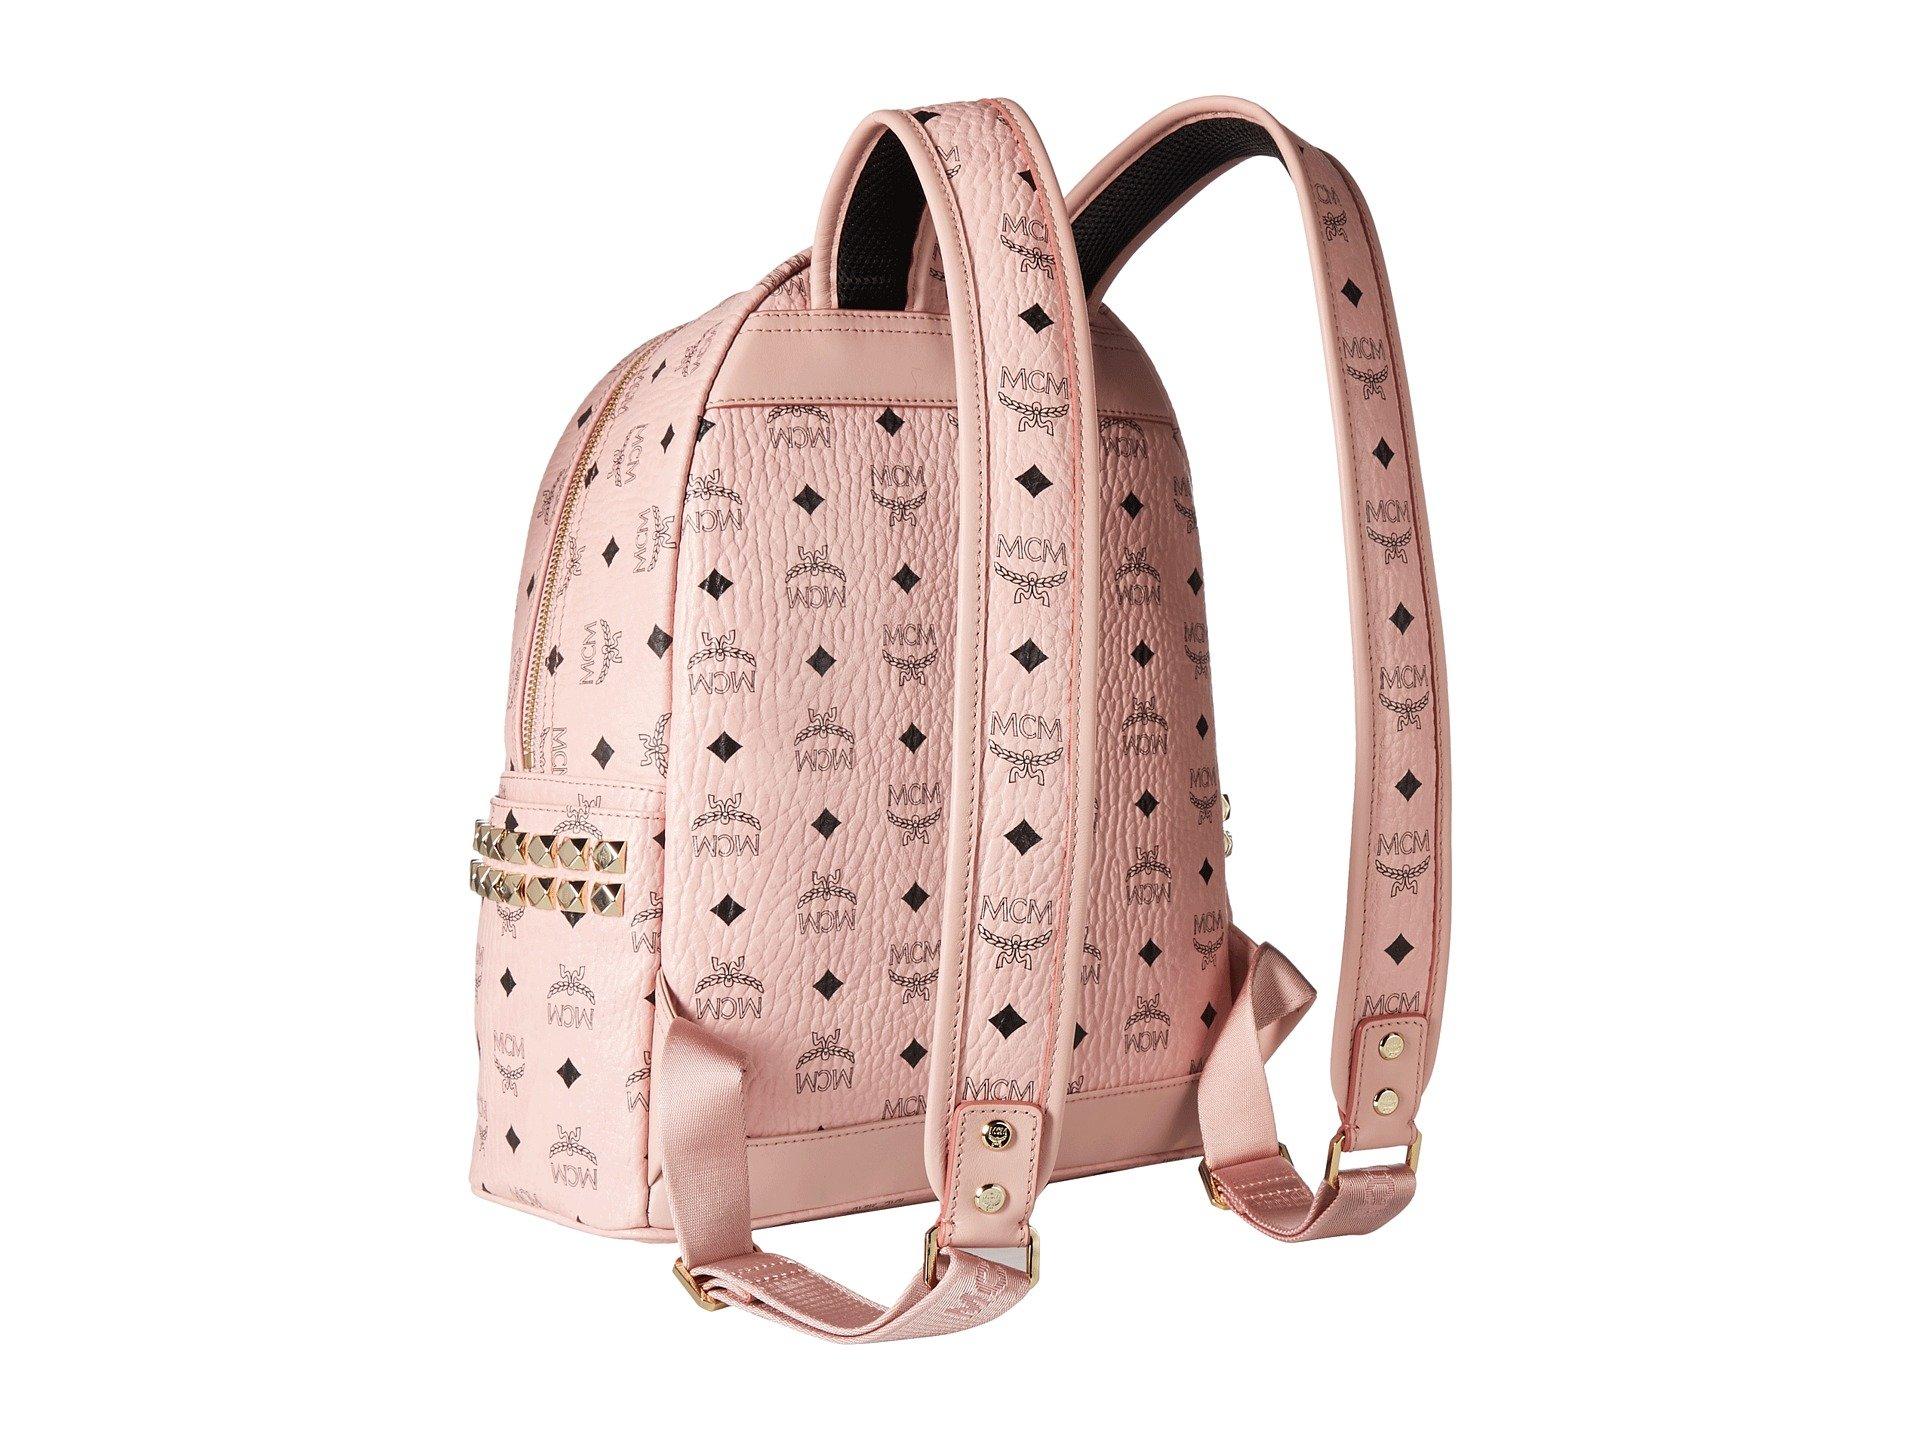 stud Side Pink Mcm Stark Soft Small Backpack Medium 7Tqfxw